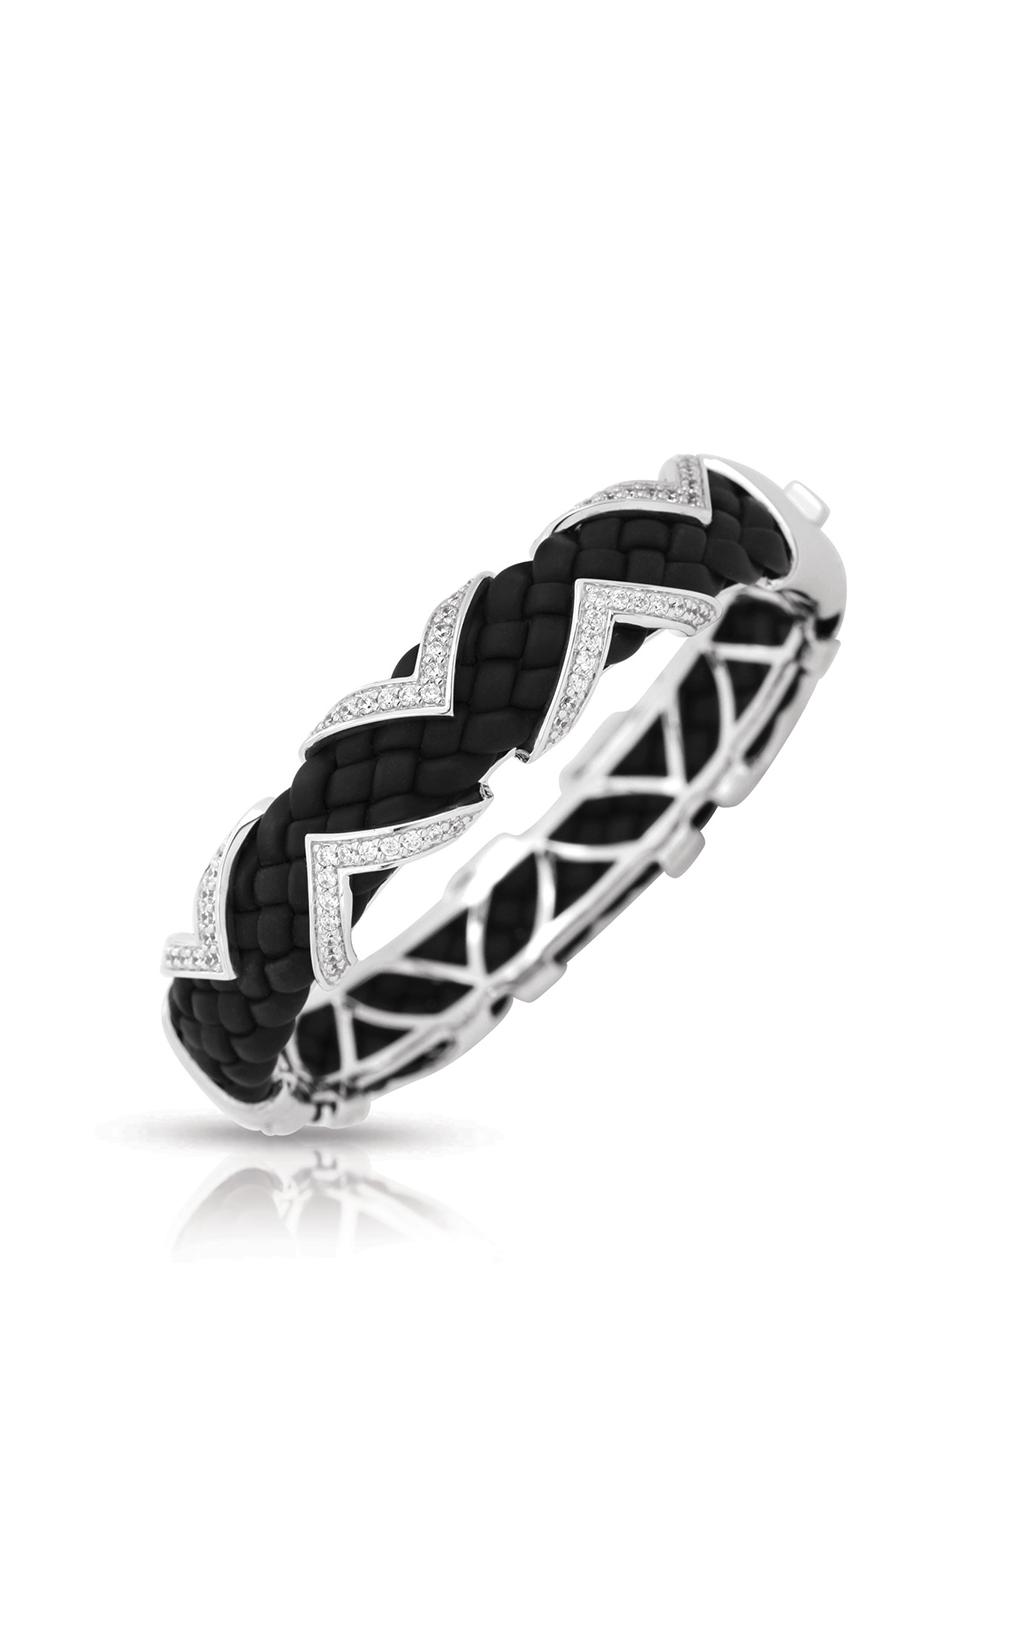 Belle Etoile Arpeggio Bracelet 07051520101-L product image